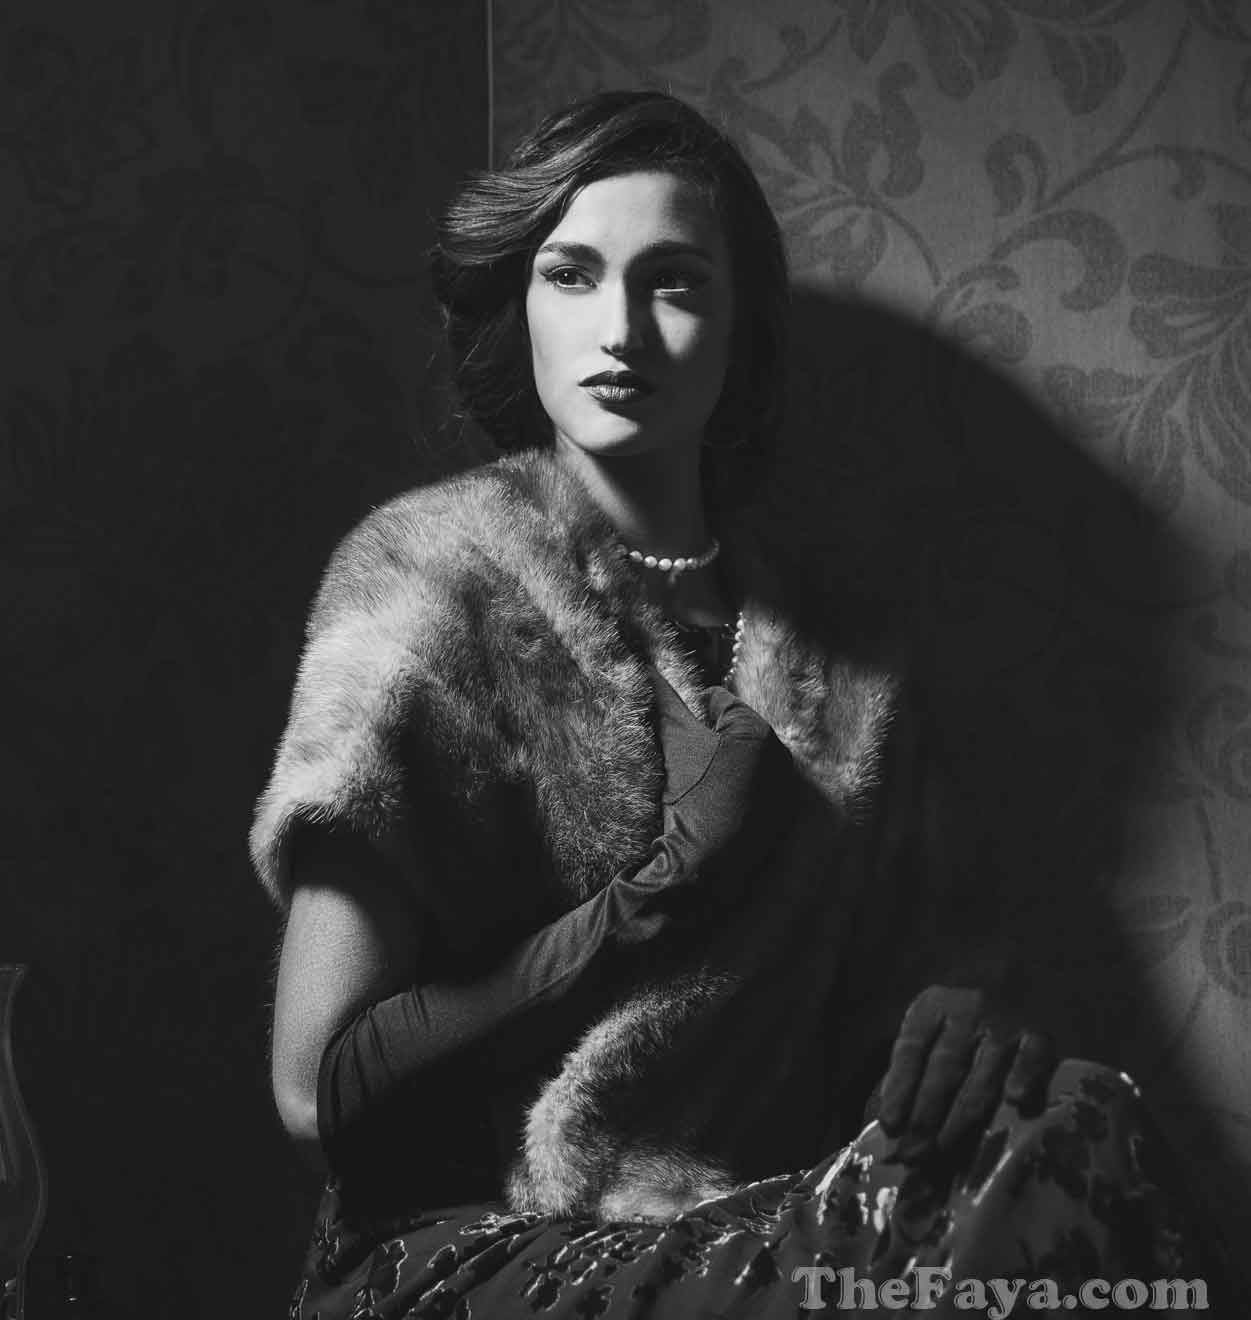 film noir femme fatale fashion - Google Search   ROSA SILVA ...